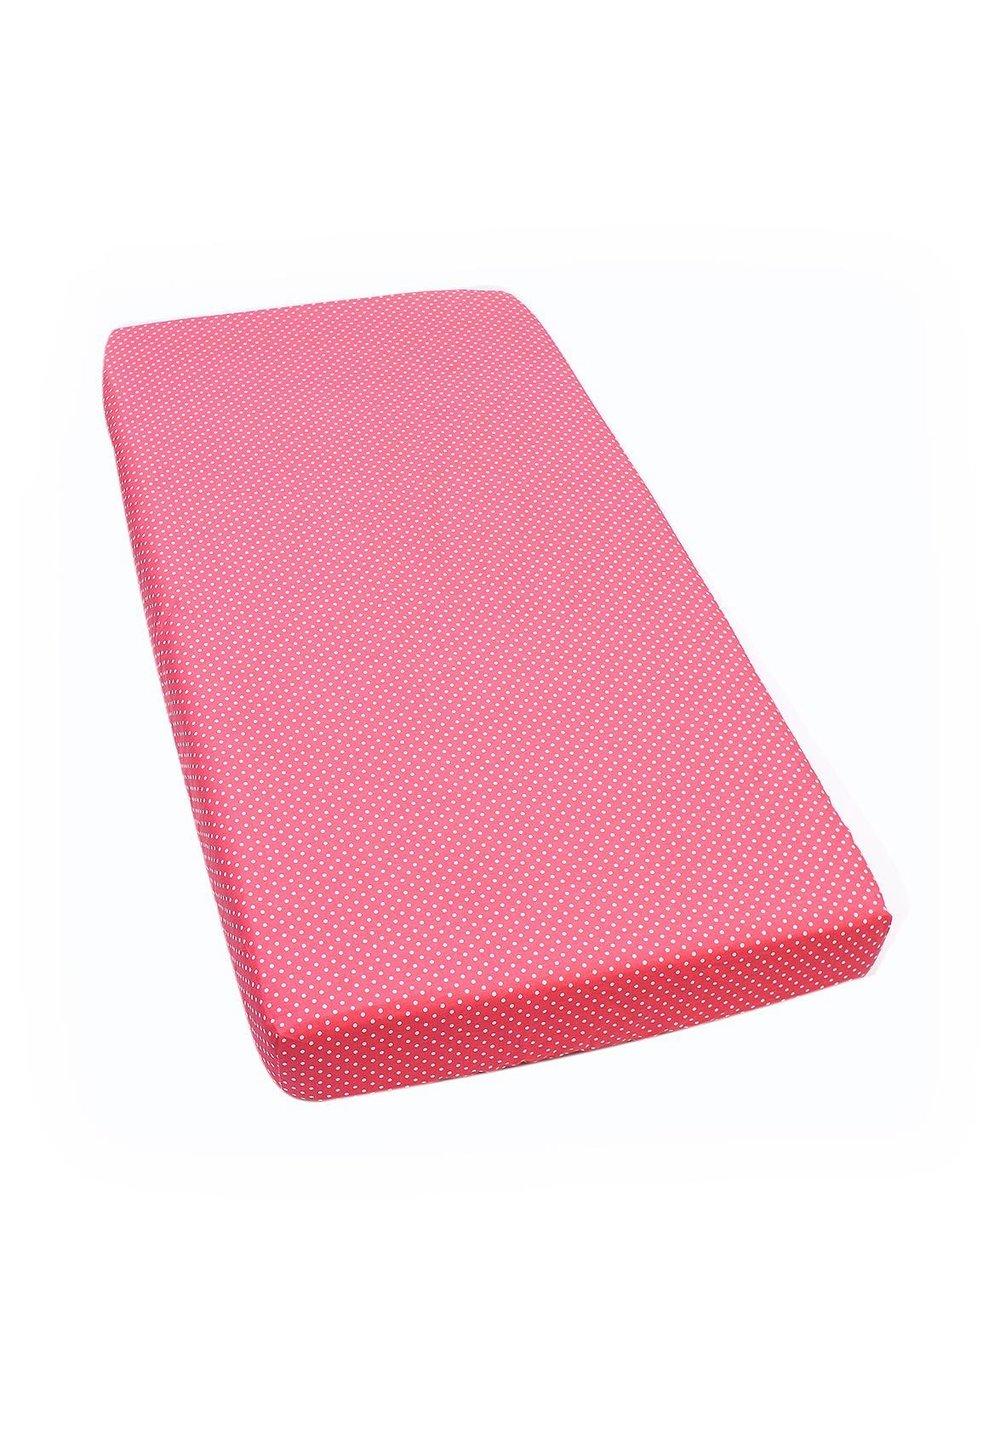 Cearceaf cu elastic, Pink with dots, 120 x 60 cm imagine